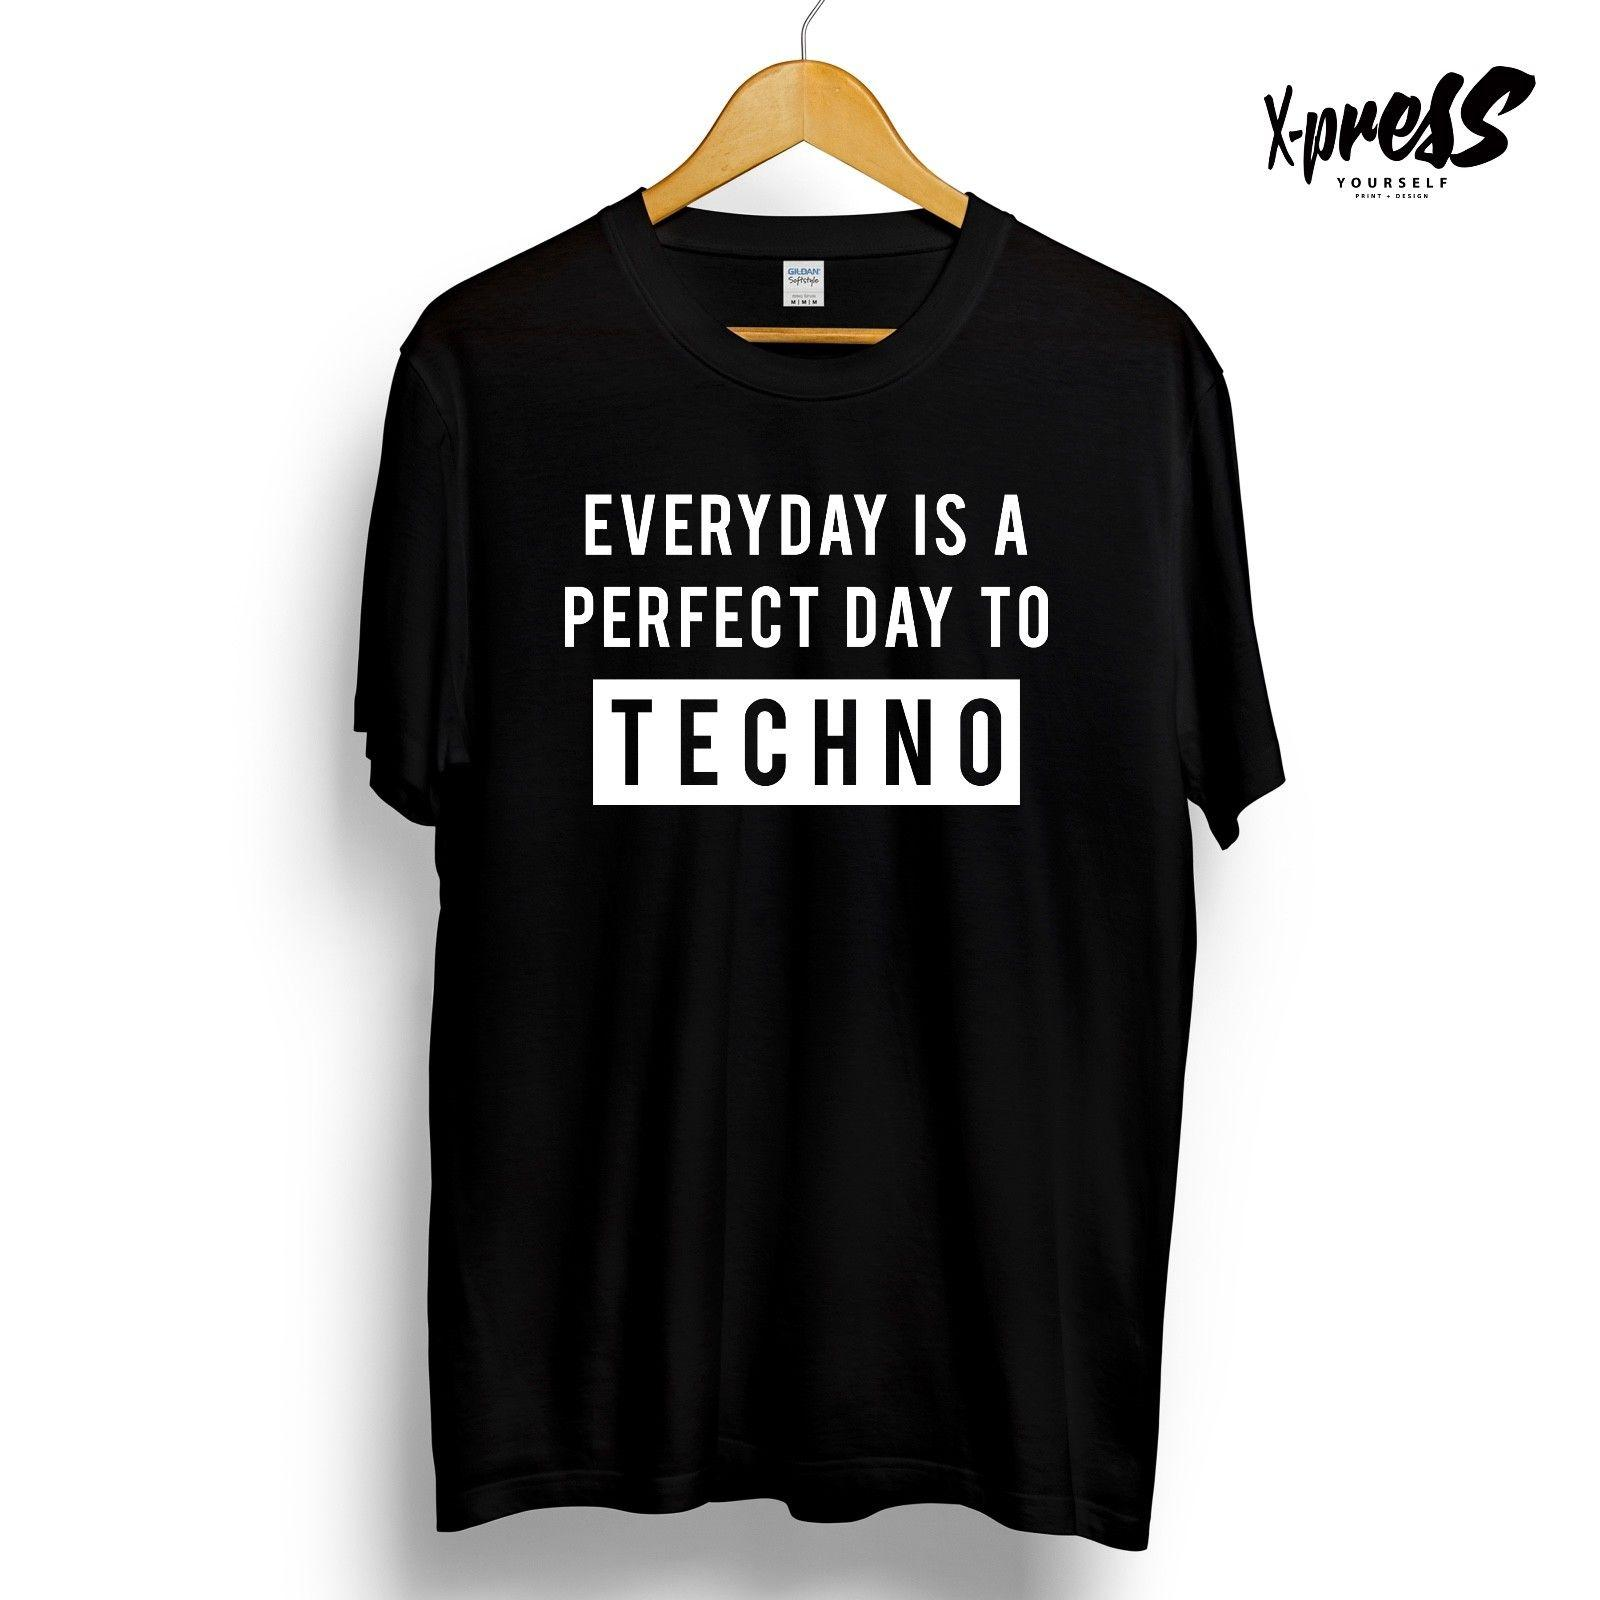 1ebbc5fc PERFECT DAY TO TECHNO Slogan T Shirt Festival Music Club Ibiza Summer Dance Tee  Funny Shirt With T Shirt Buy Funny T Shirts Online From Tshirtbakers, ...